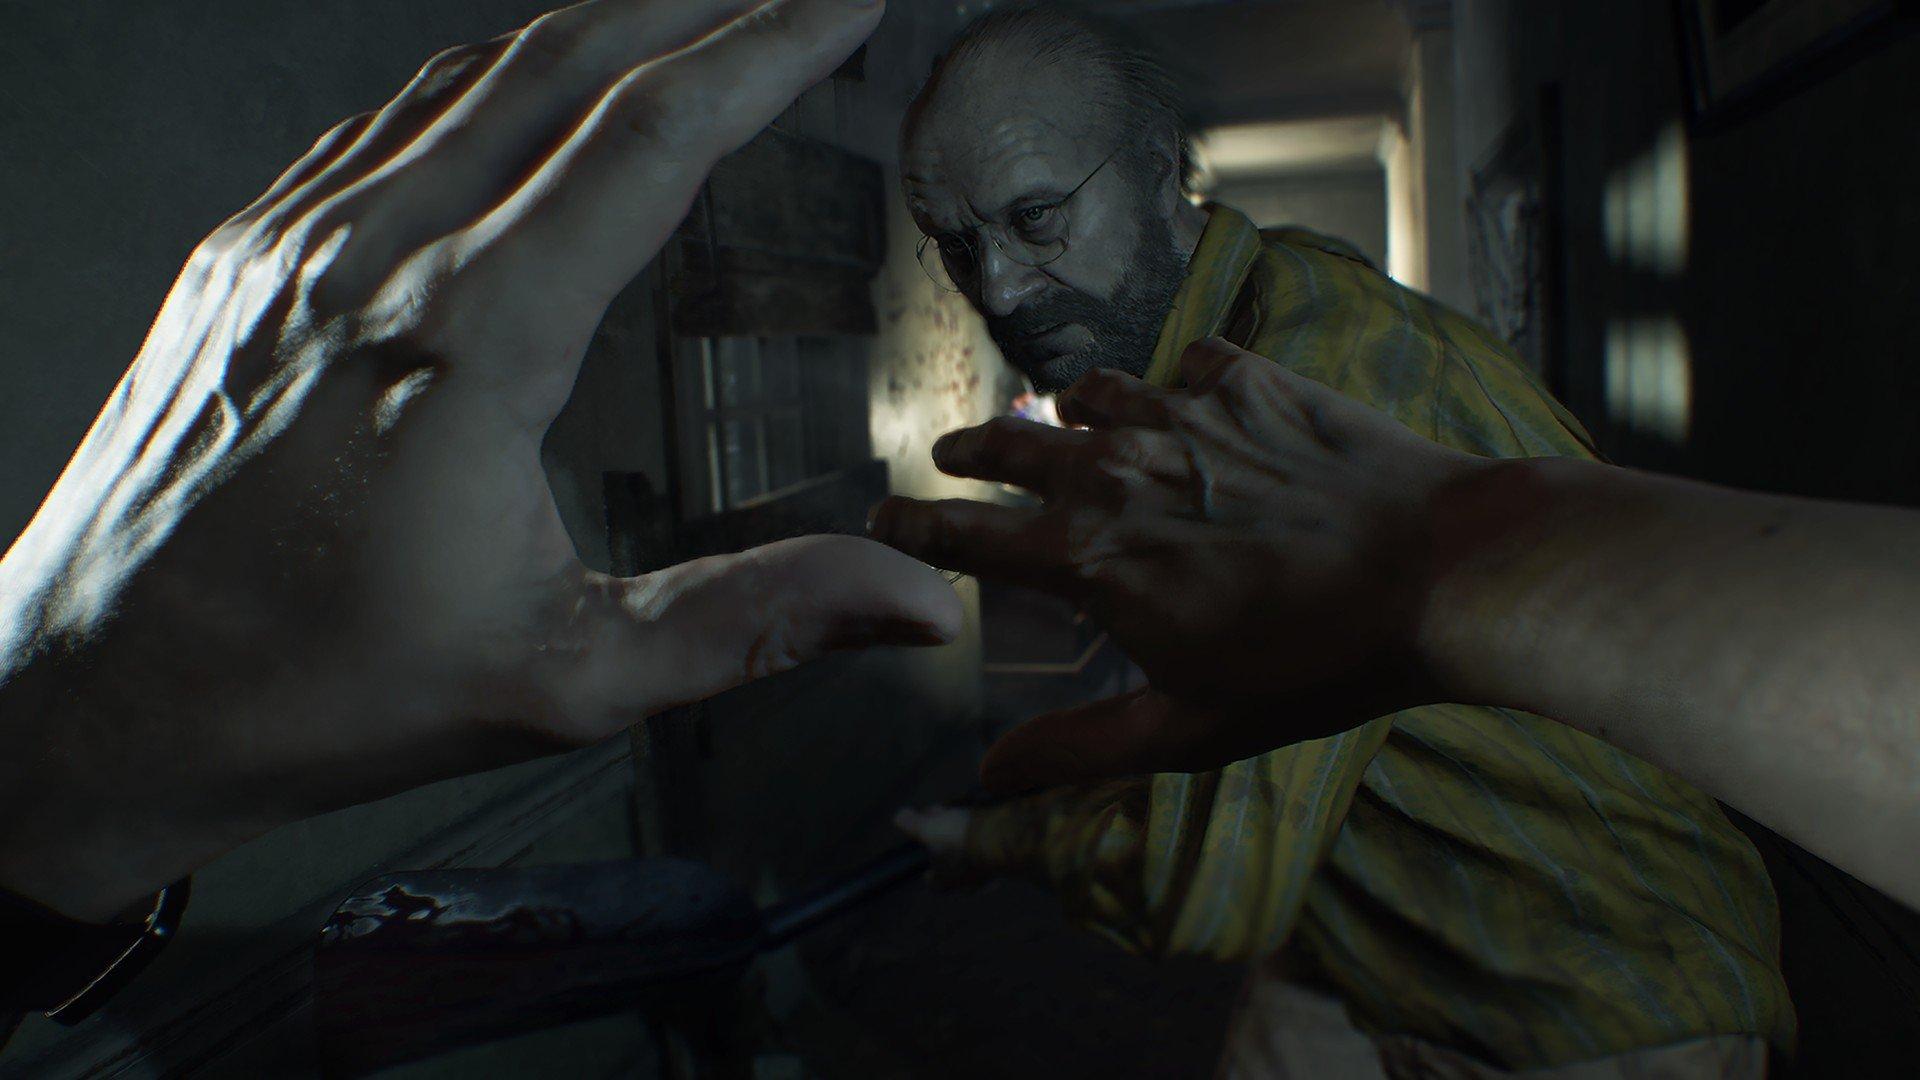 RESIDENT EVIL 7 biohazard / BIOHAZARD 7 resident evil game image